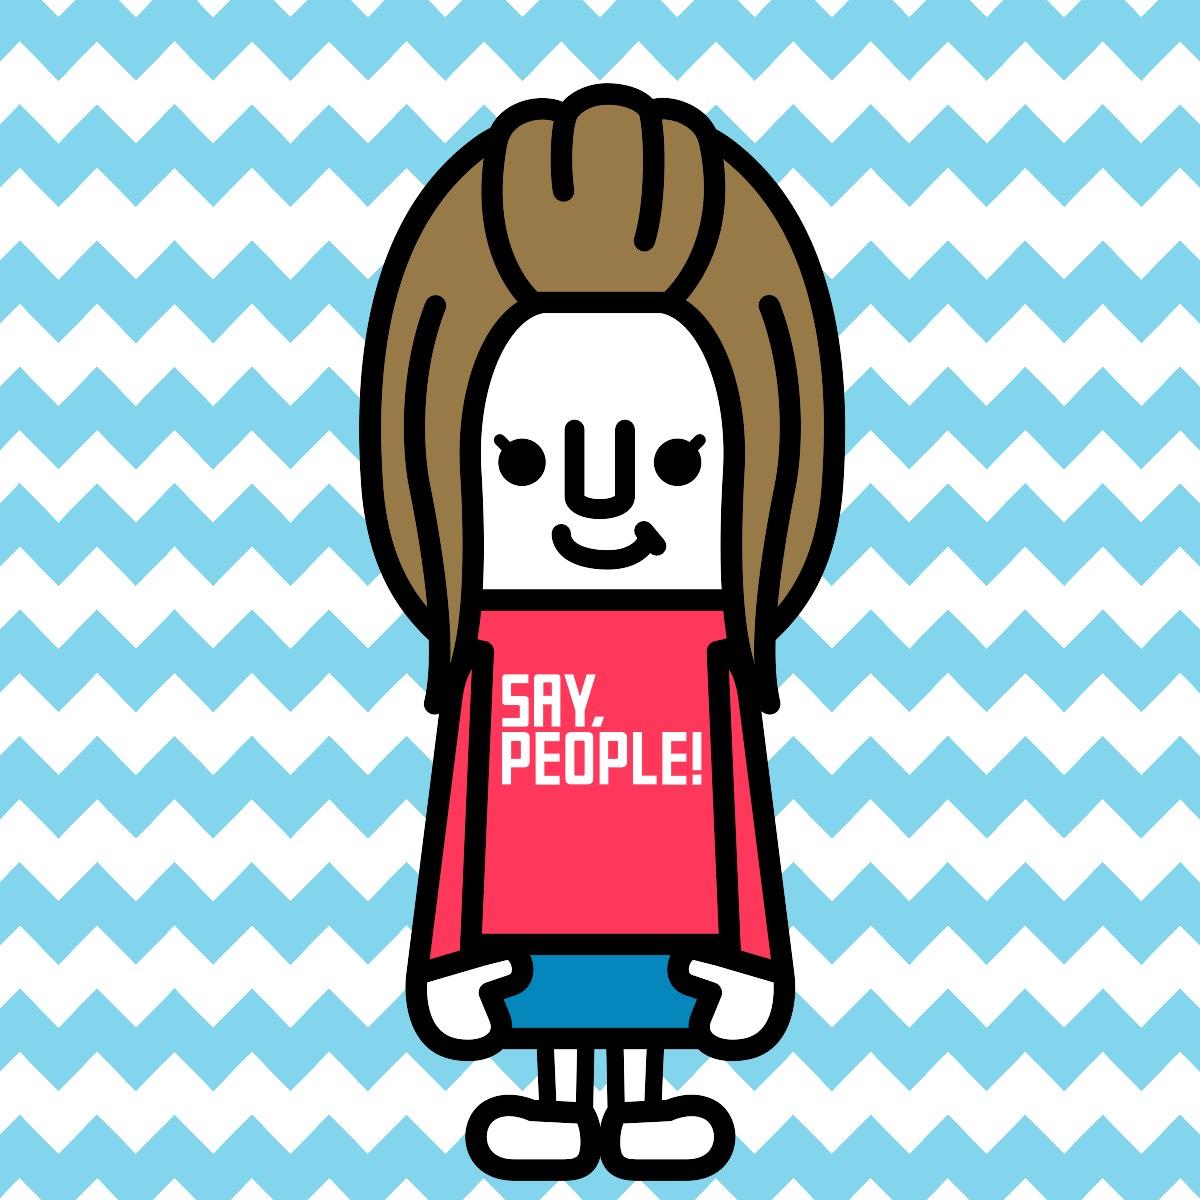 SAY, PEOPLE!